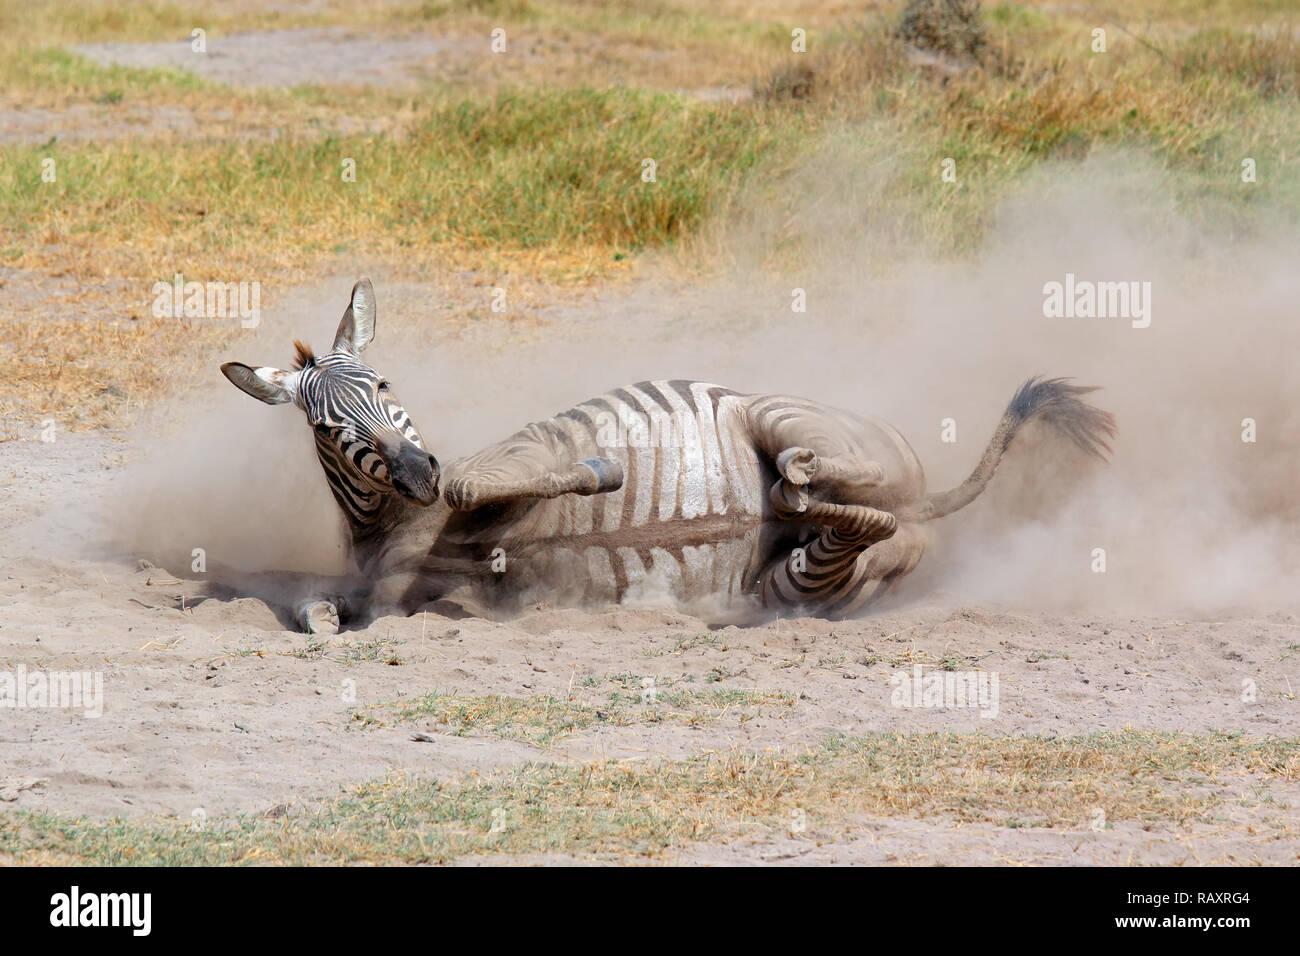 A plains zebra (Equus burchelli) rolling in dust, Amboseli National Park, Kenya - Stock Image